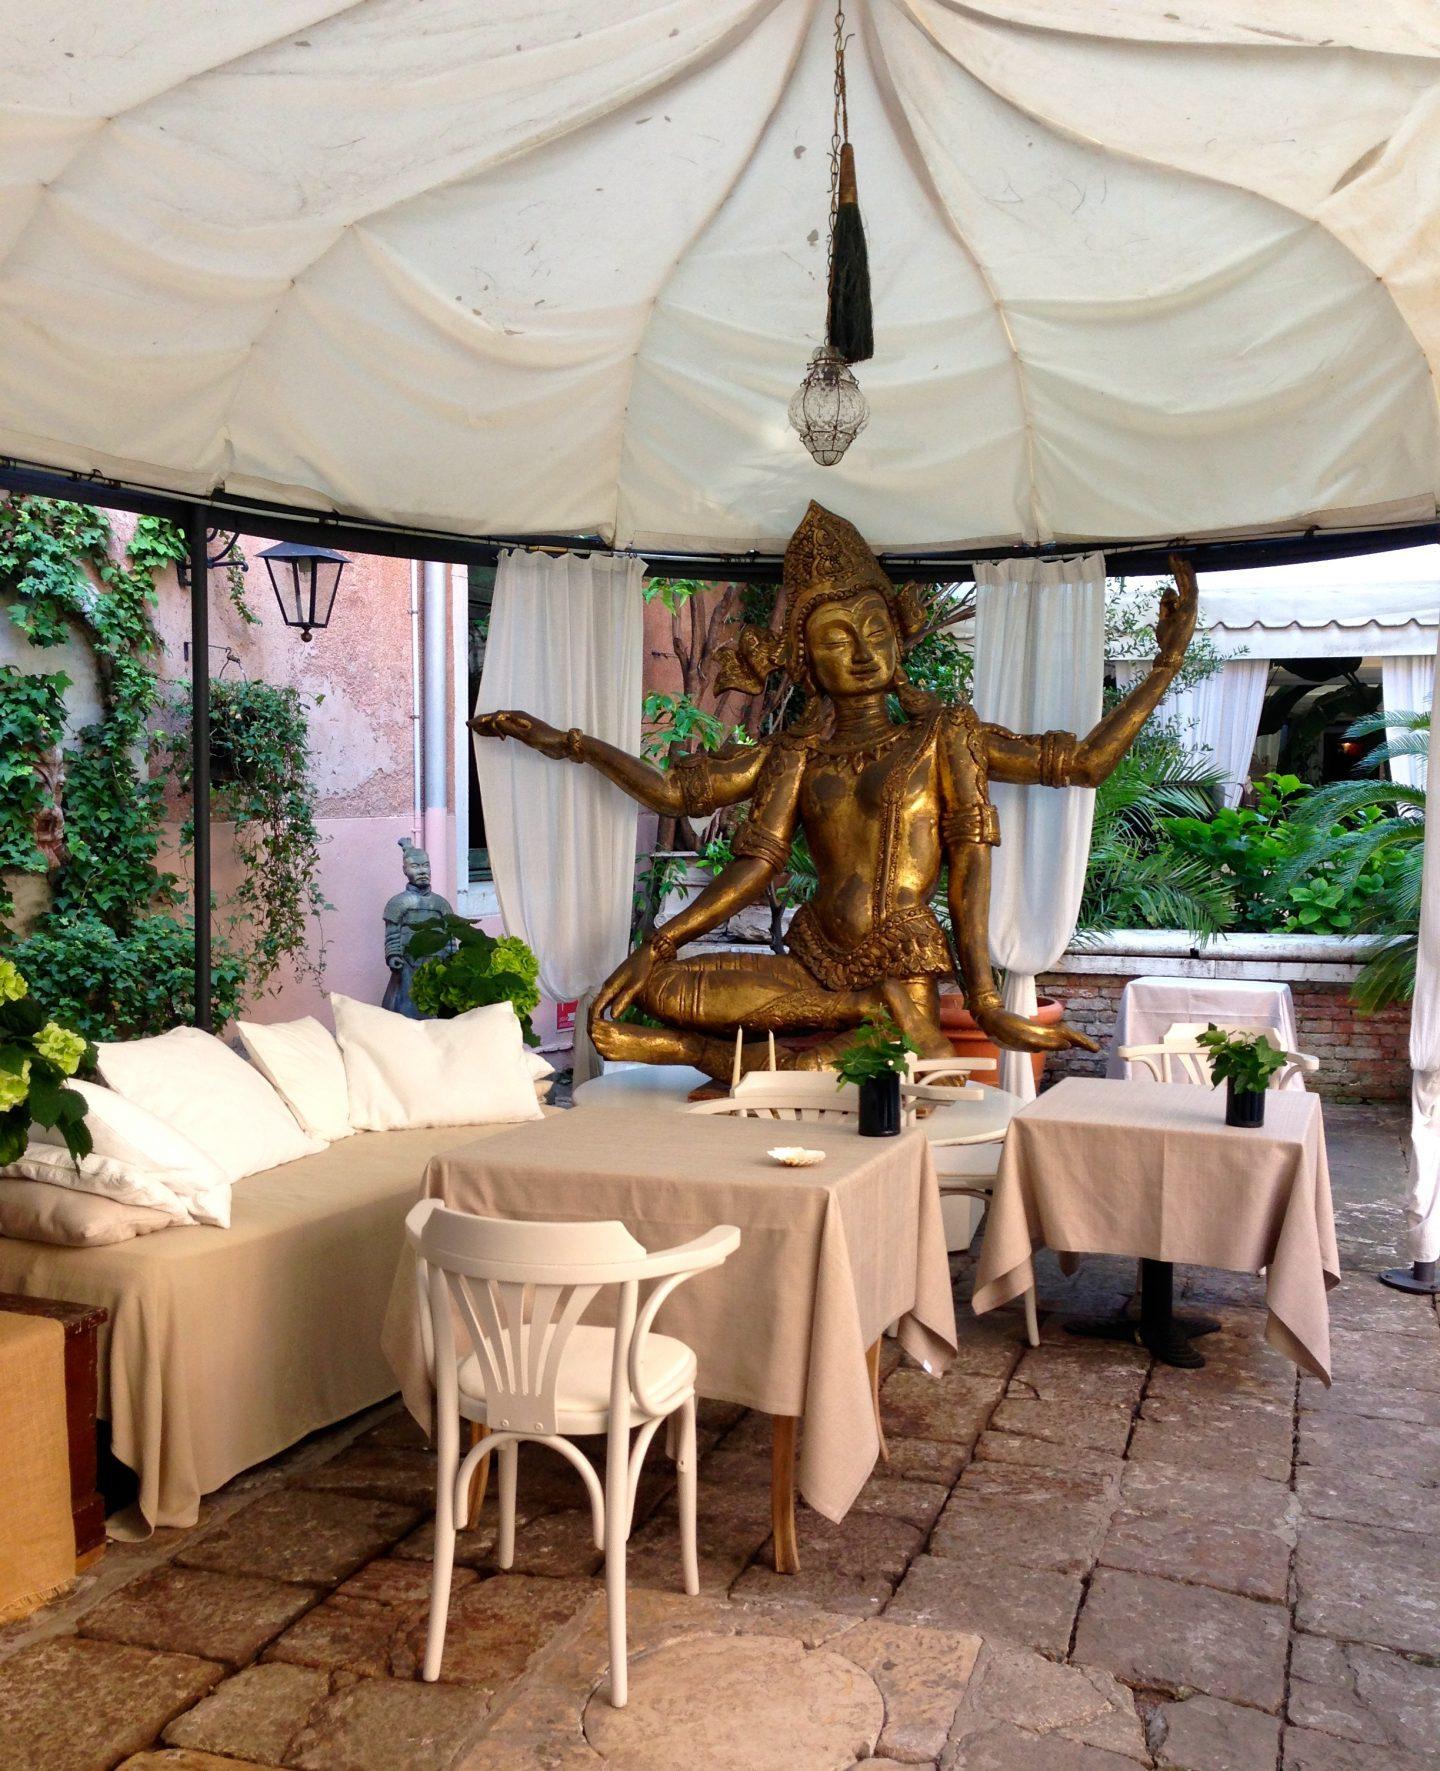 Eating breakfast in the courtyard of Hotel Metropole in Venice.